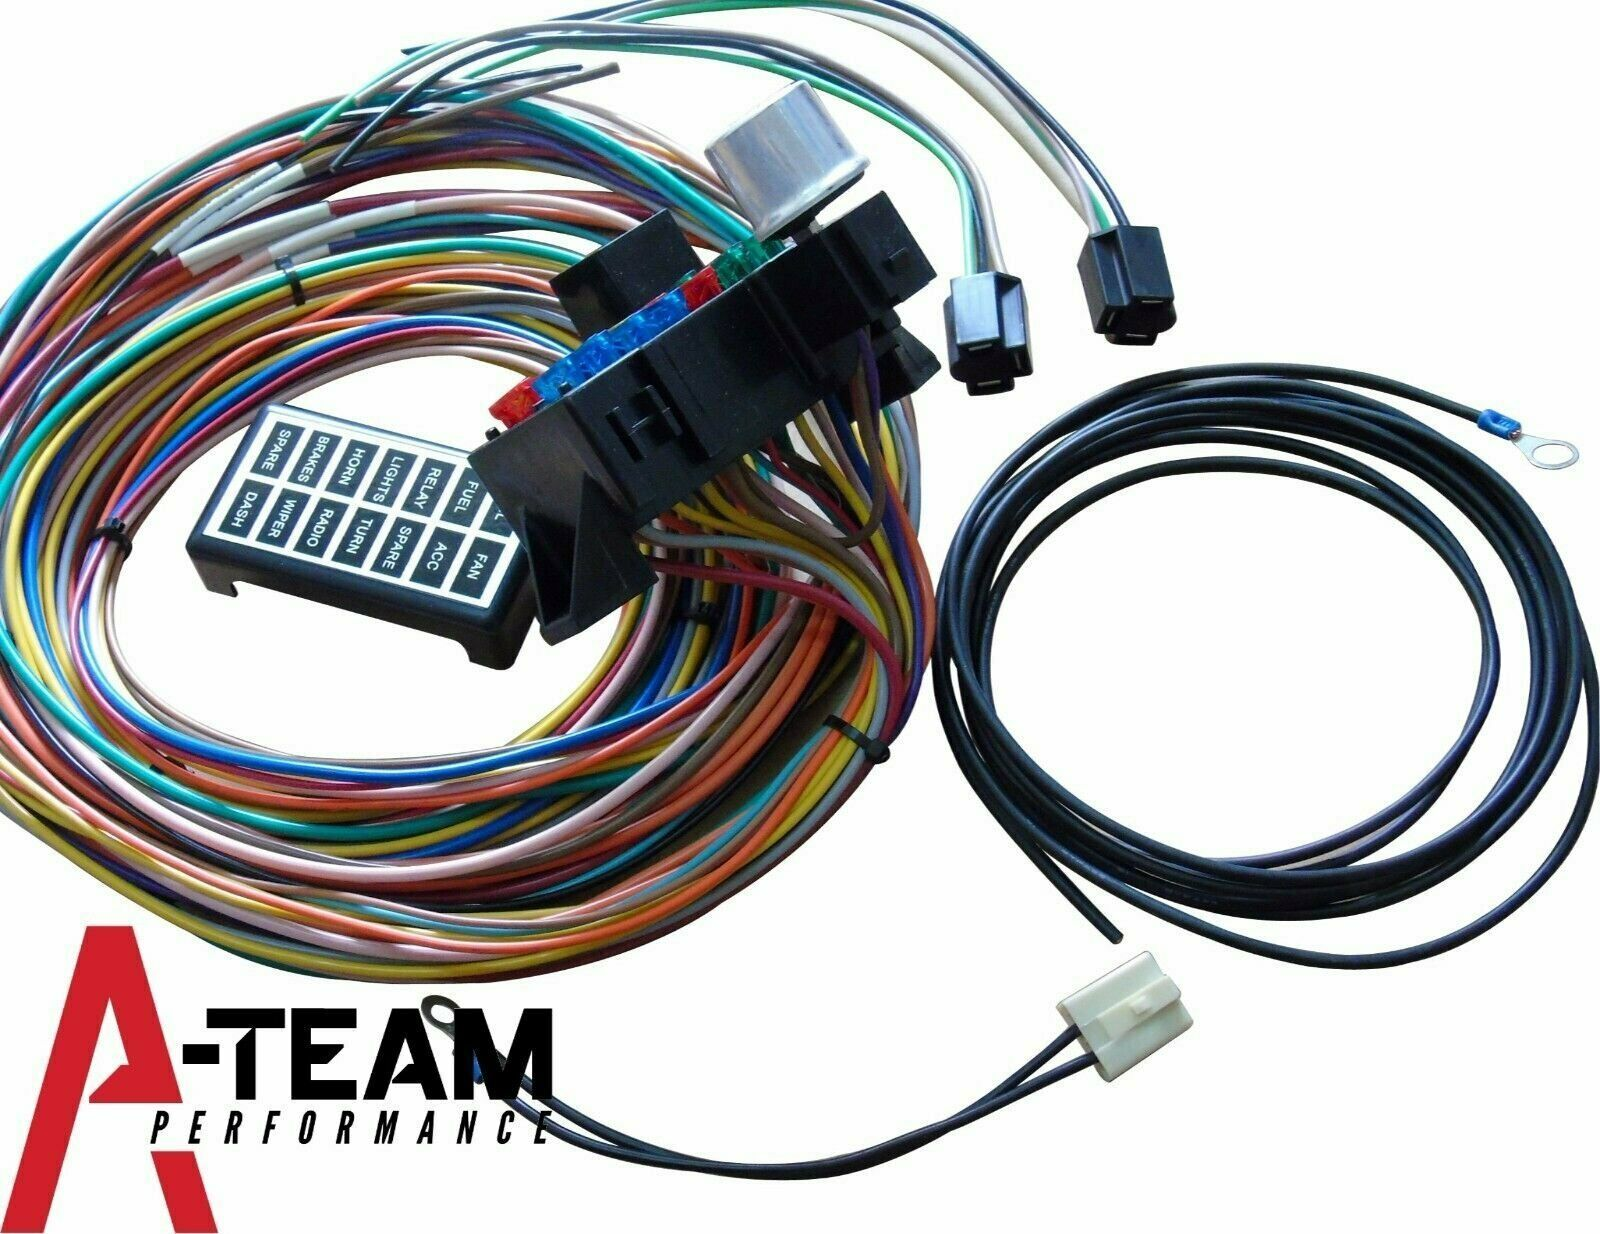 14 Circuit Basic Wire Kit Small Wiring Harness Rat Street Rod Sand Car Truck